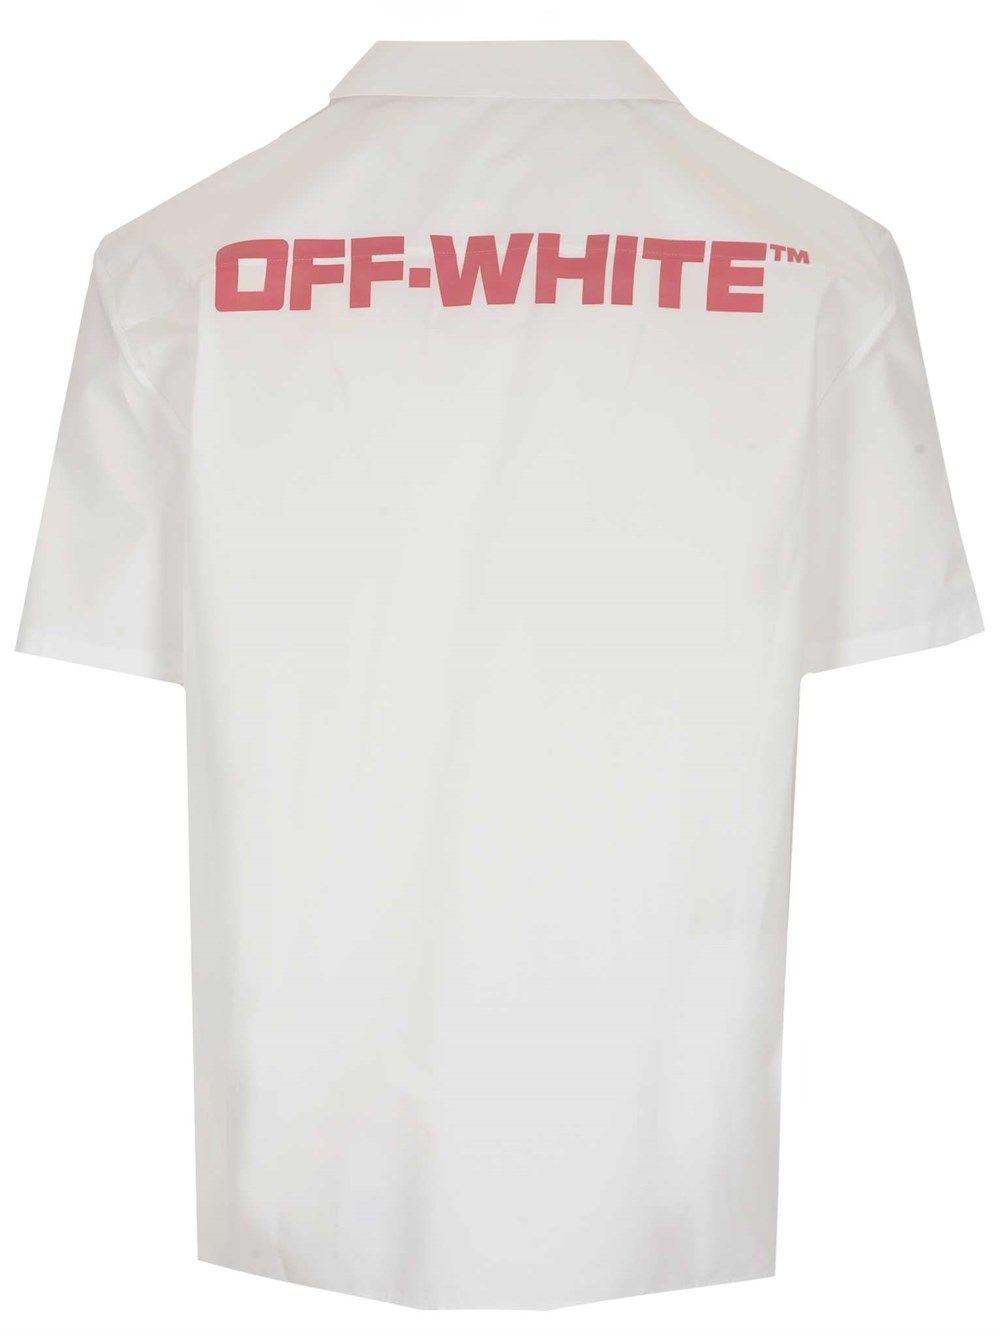 OFF-WHITE Cottons OFF-WHITE MEN'S WHITE COTTON SHIRT